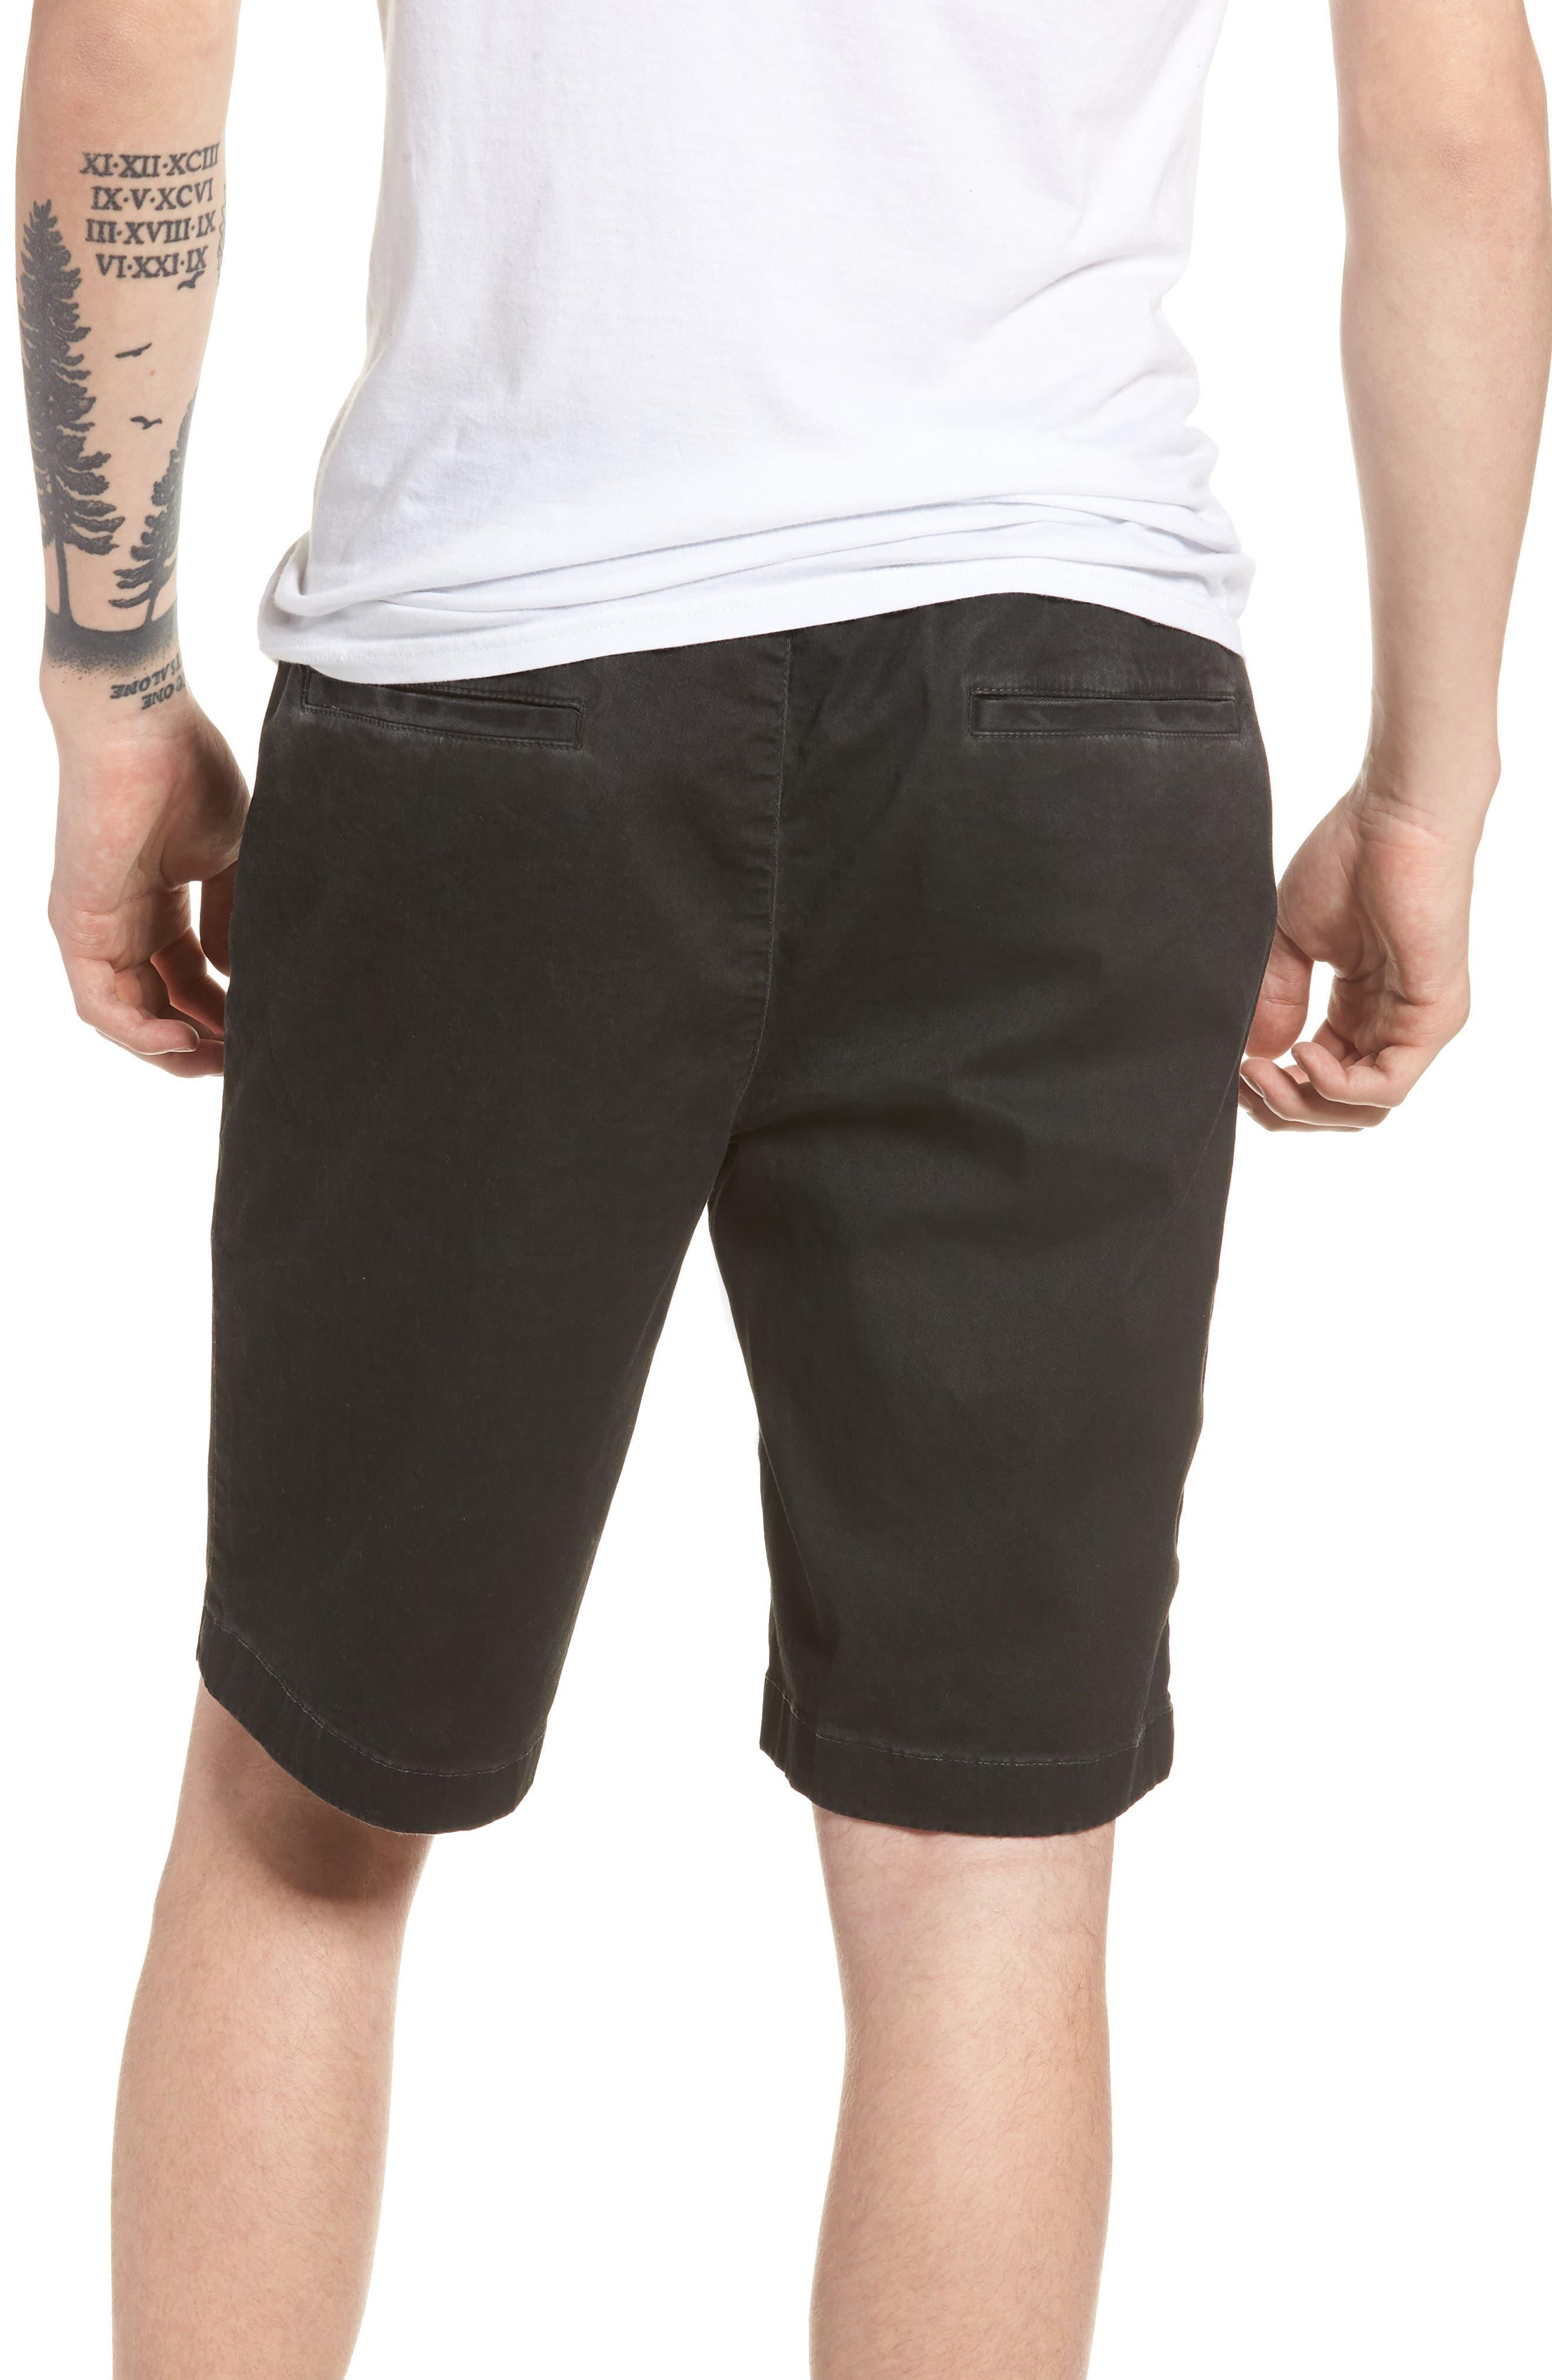 Pigment Dye Volley Shorts,                             Alternate thumbnail 2, color,                             Grey Onyx